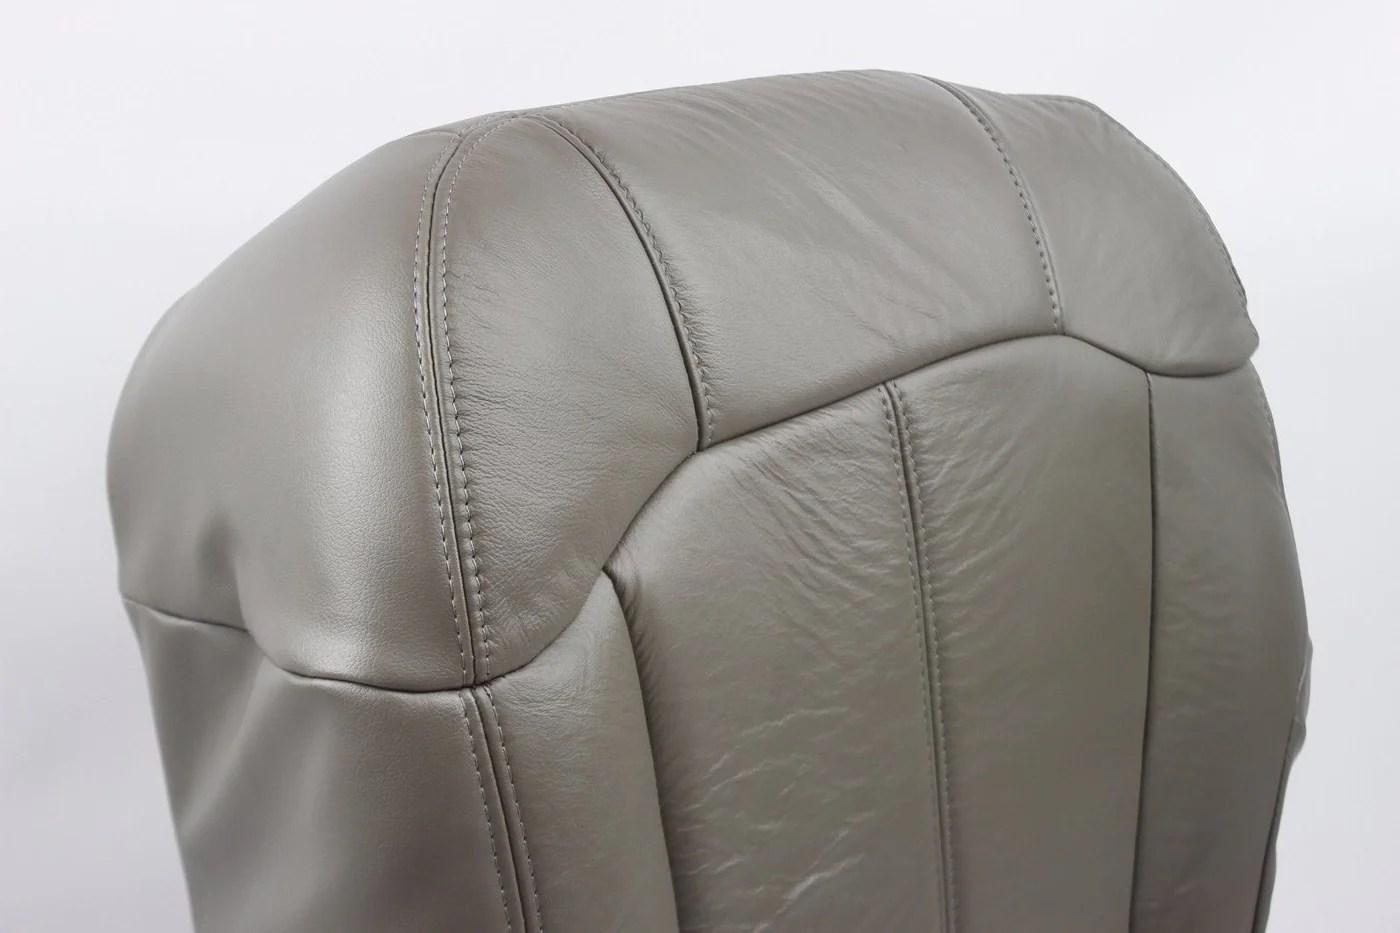 2002 2001 2000 chevy tahoe suburban silverado driver bottom seat cover gray 122 auto seat  [ 1400 x 933 Pixel ]